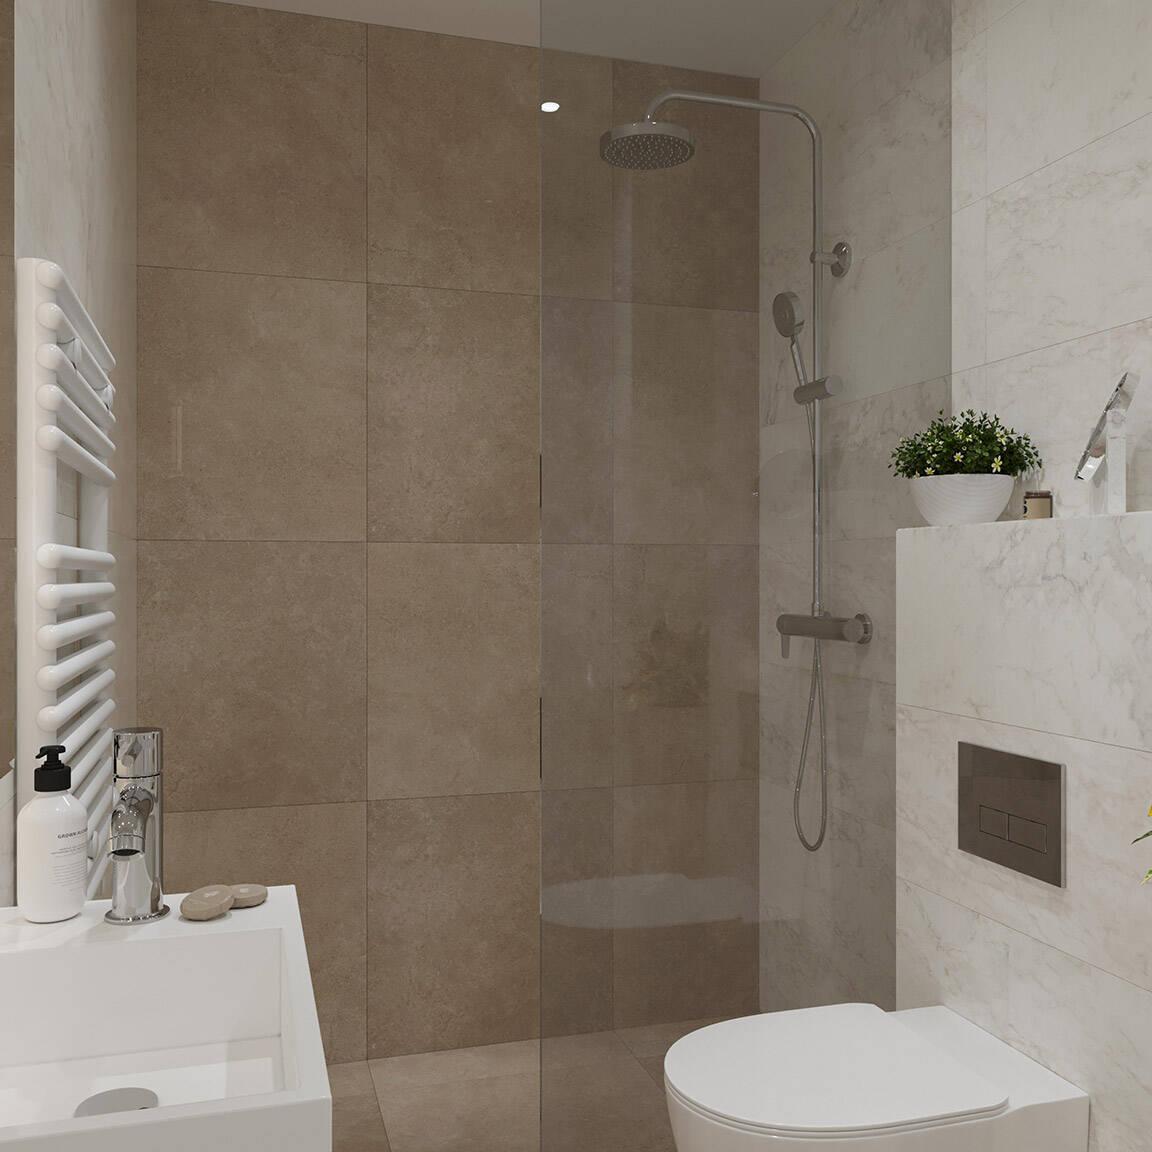 Catedral Residence - Bathroom - Marazzi Ceramic tiles - 15